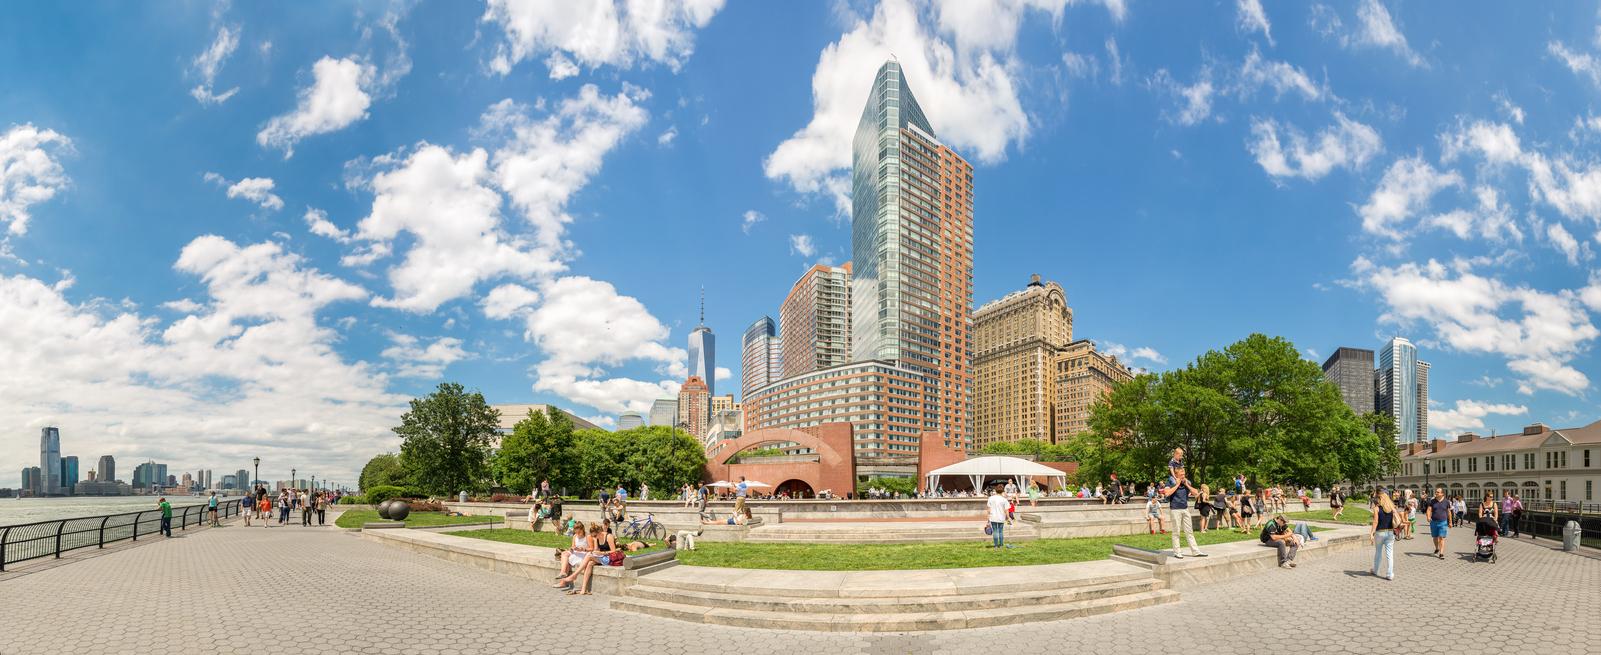 The Battery Park History